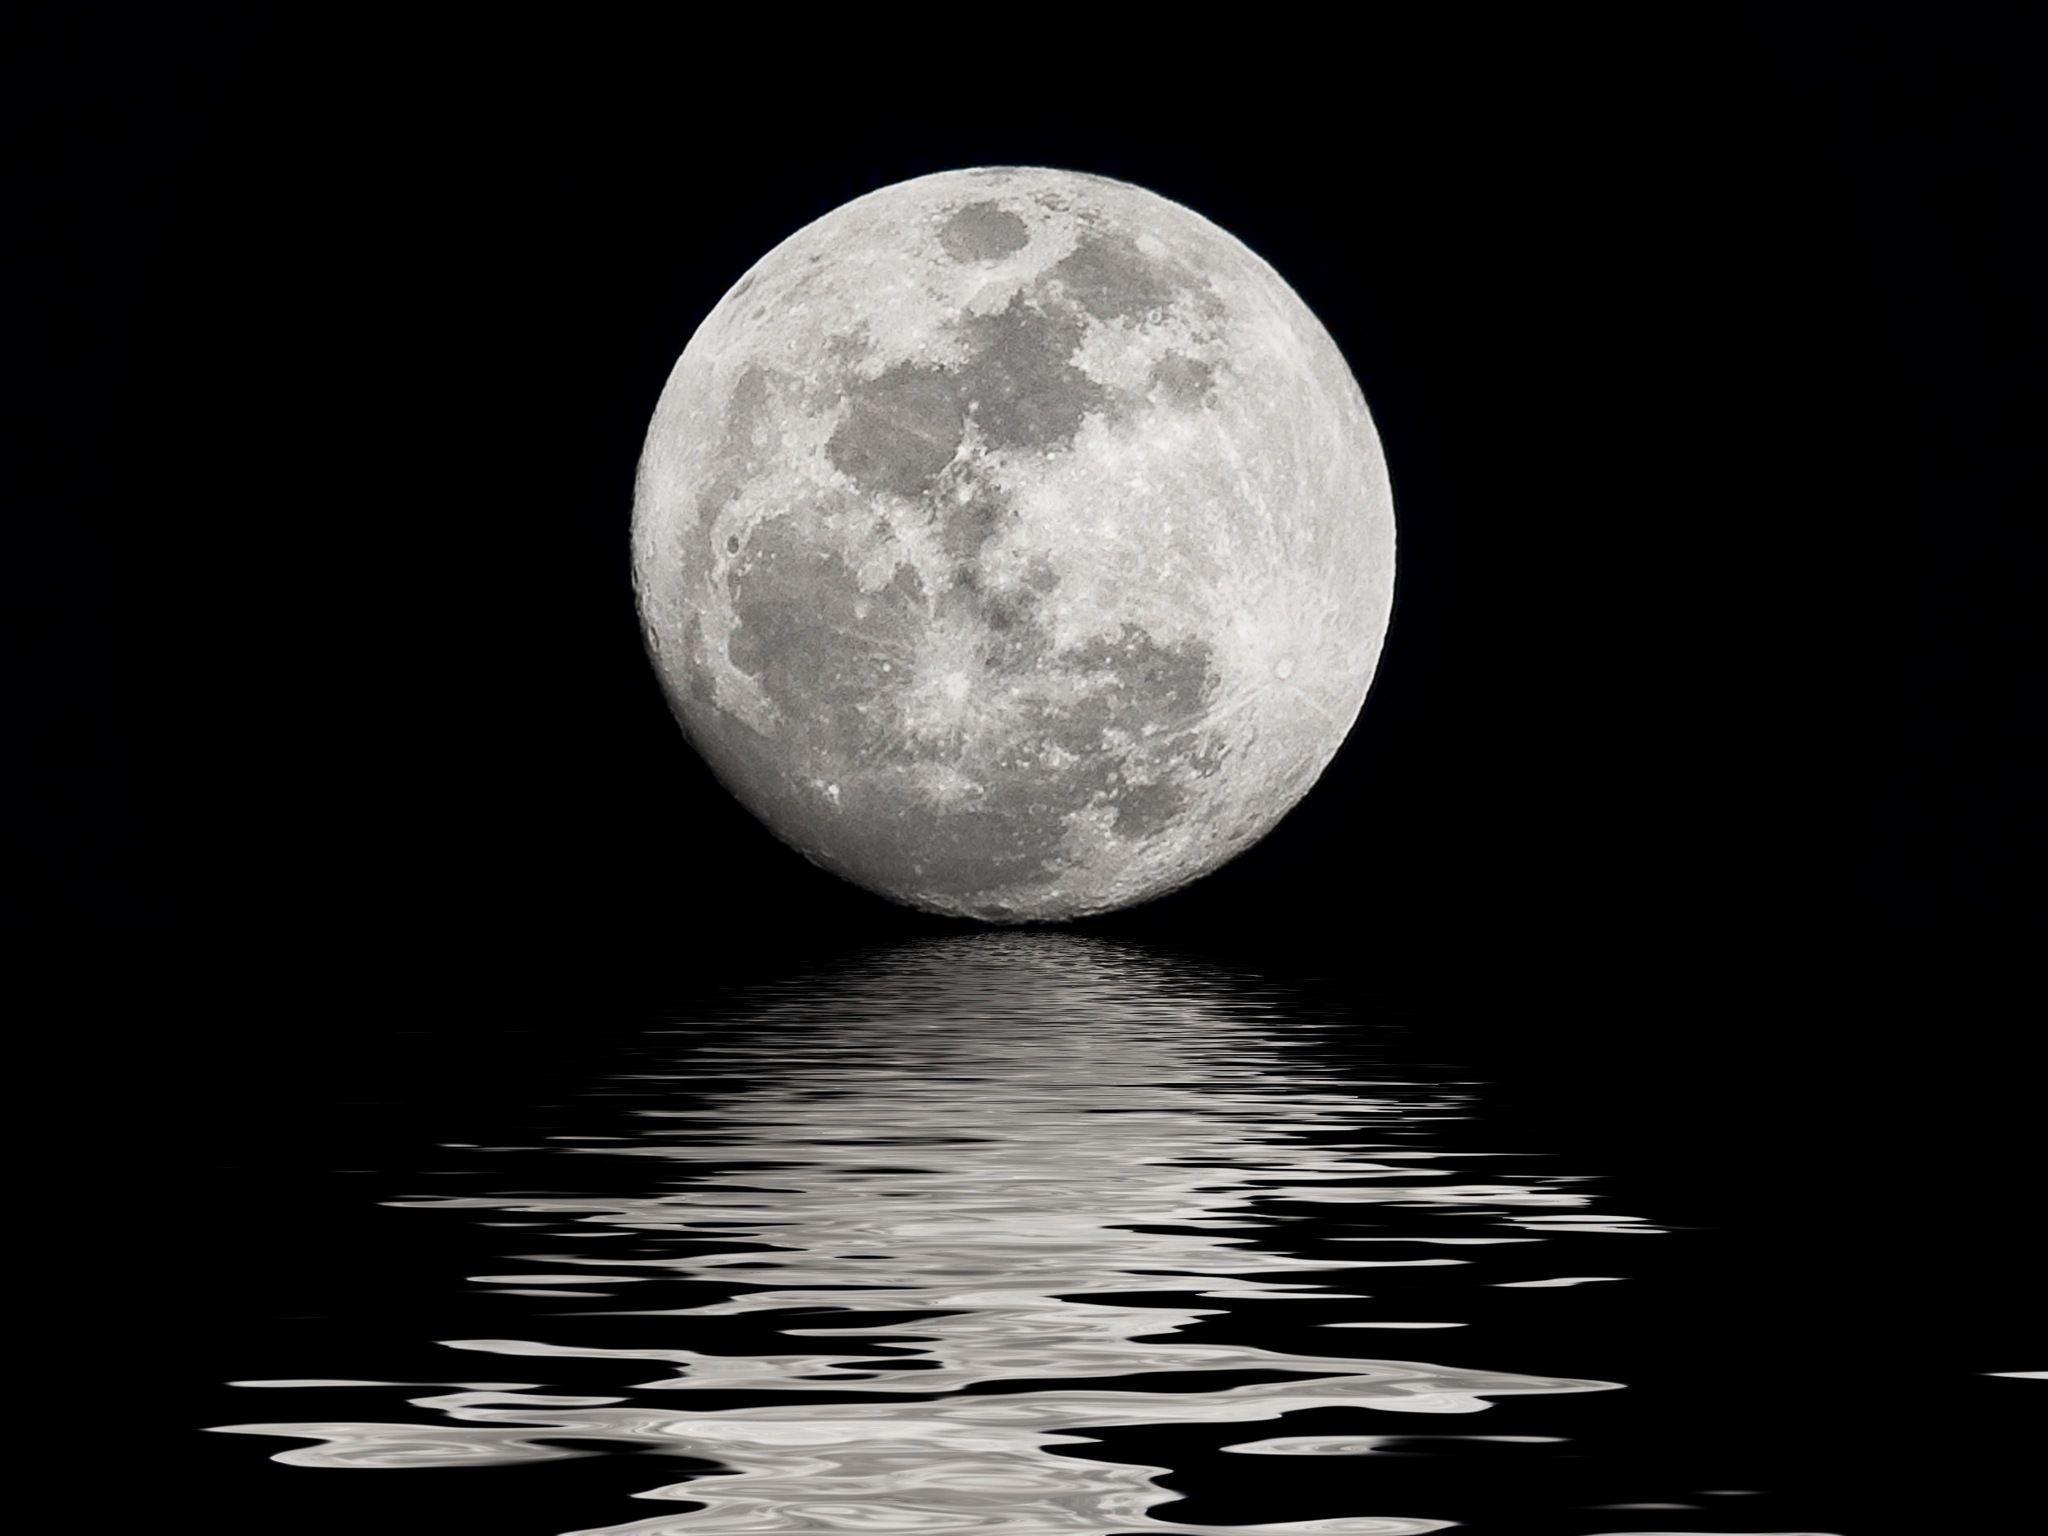 Moon Sea HD Wallpaper | Moon and Sea Images | Cool Wallpapers